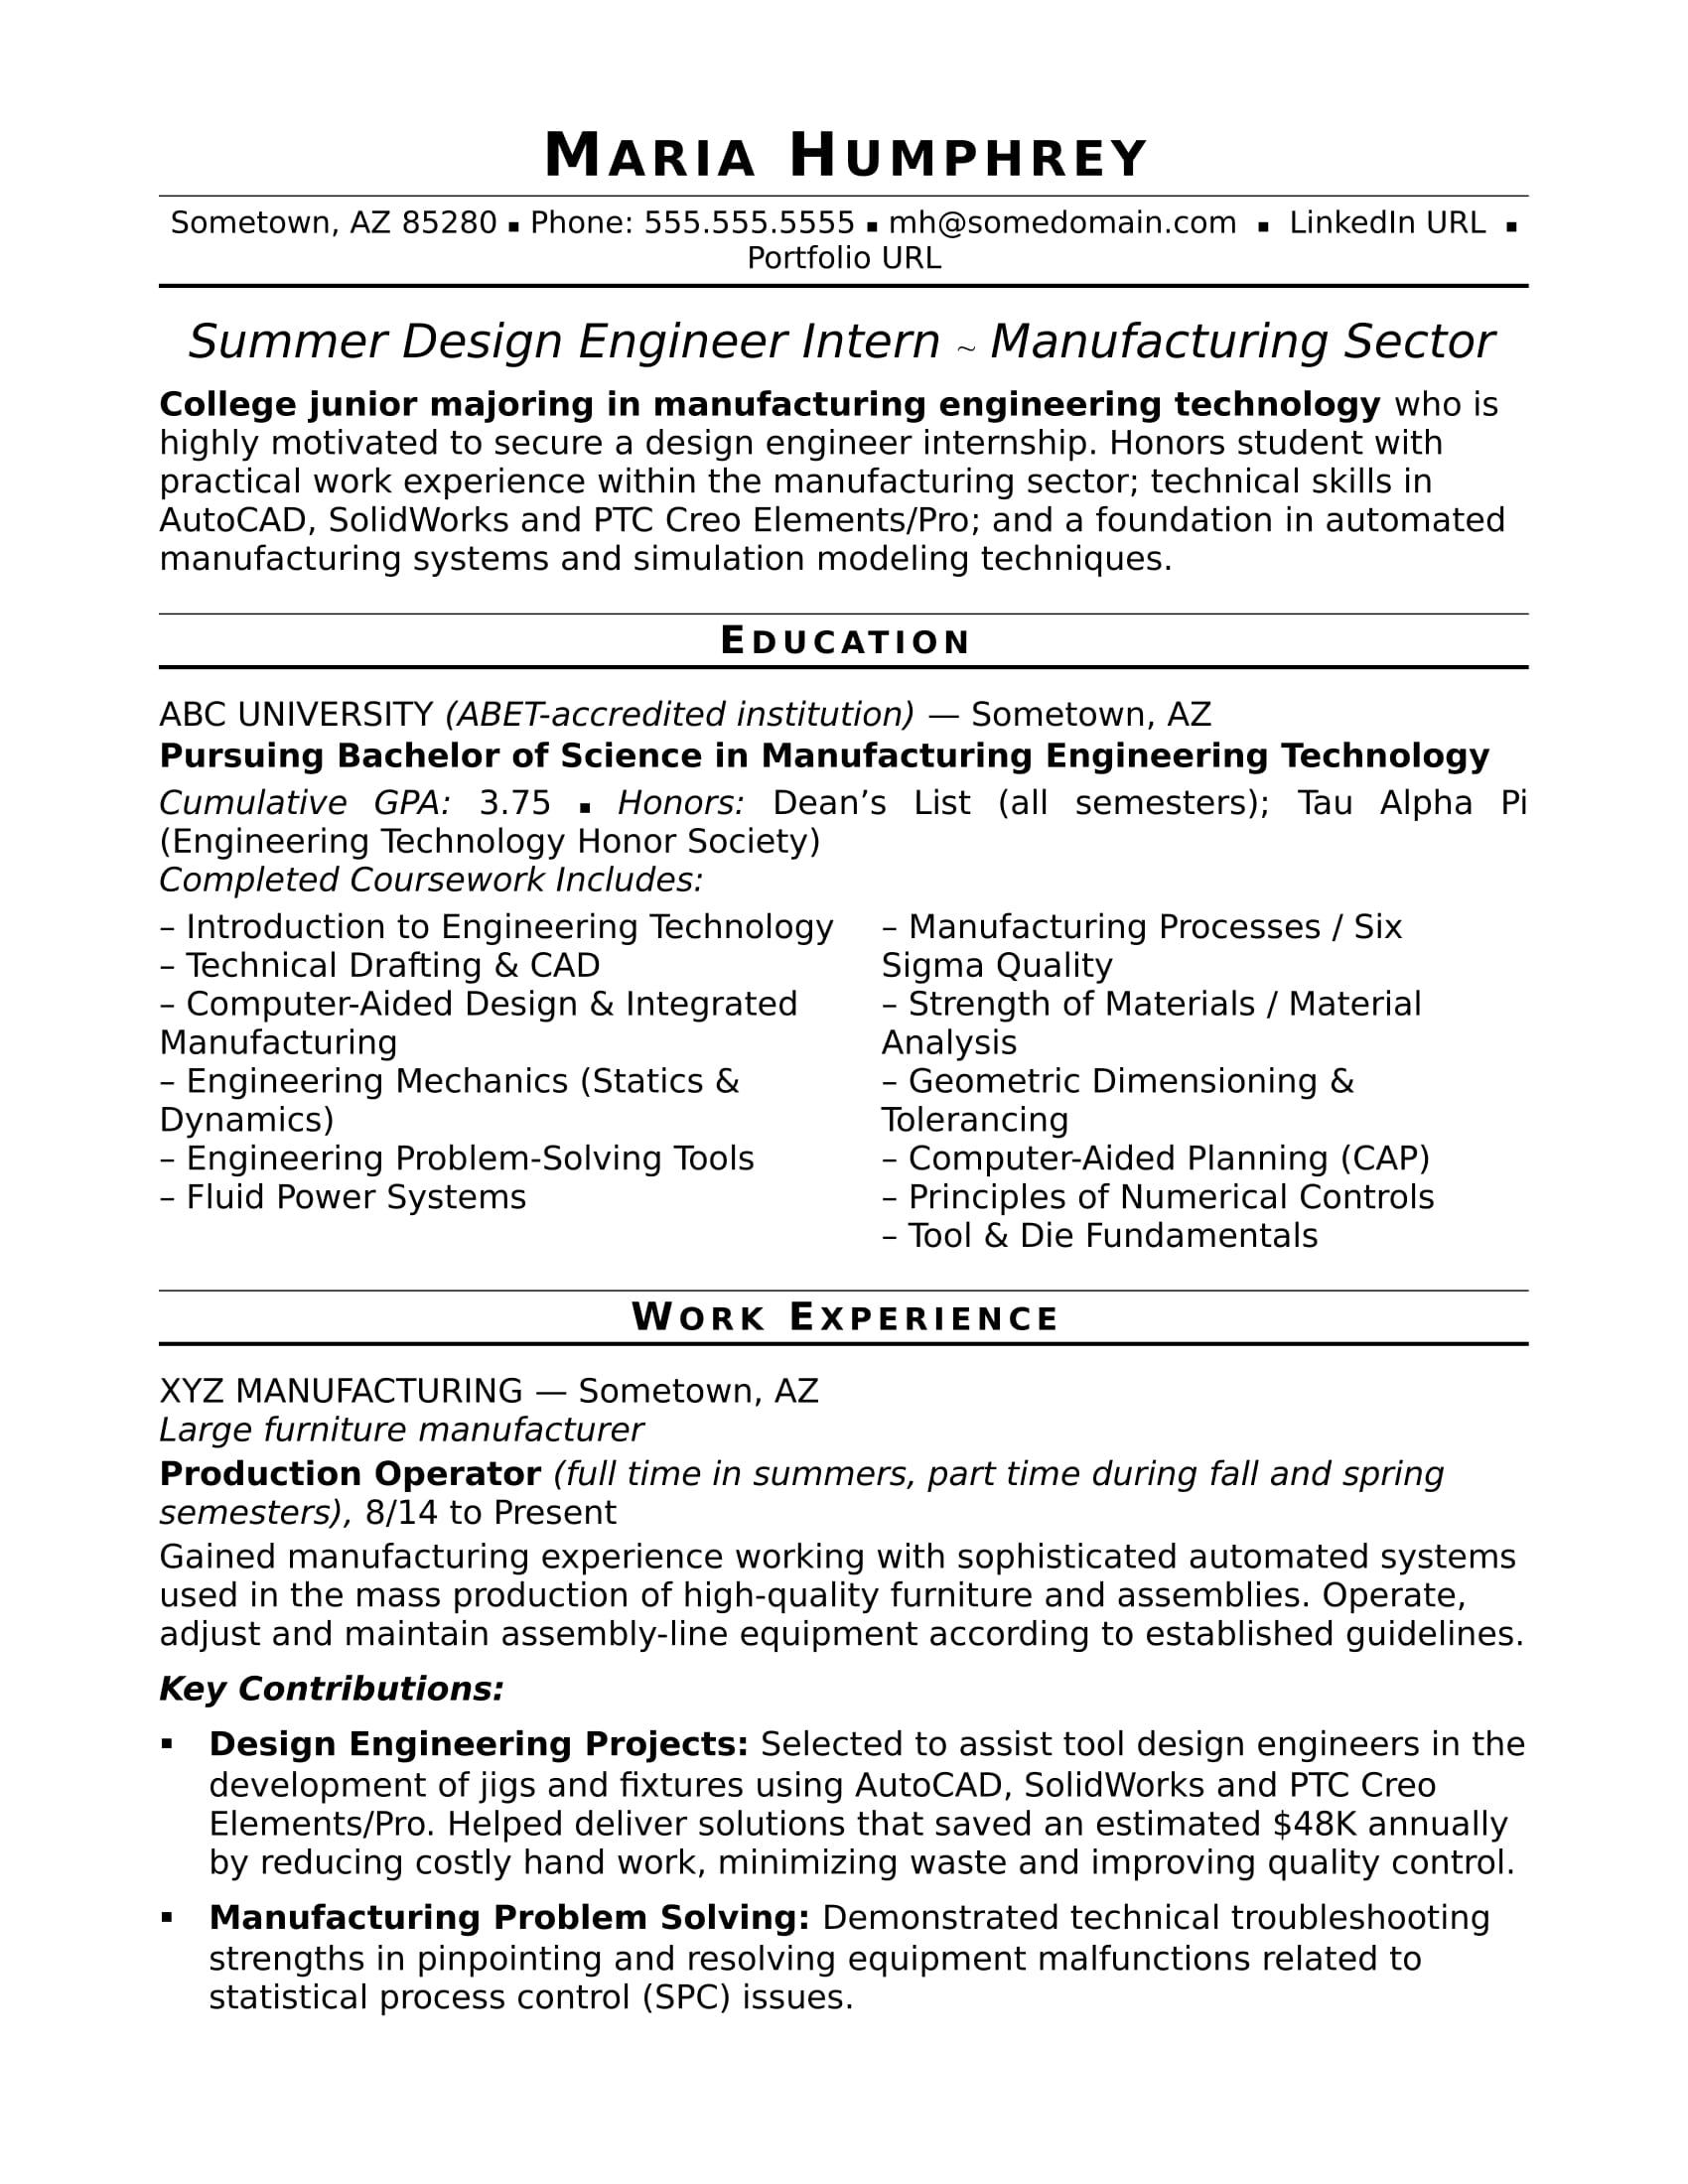 medical device engineer resume sample